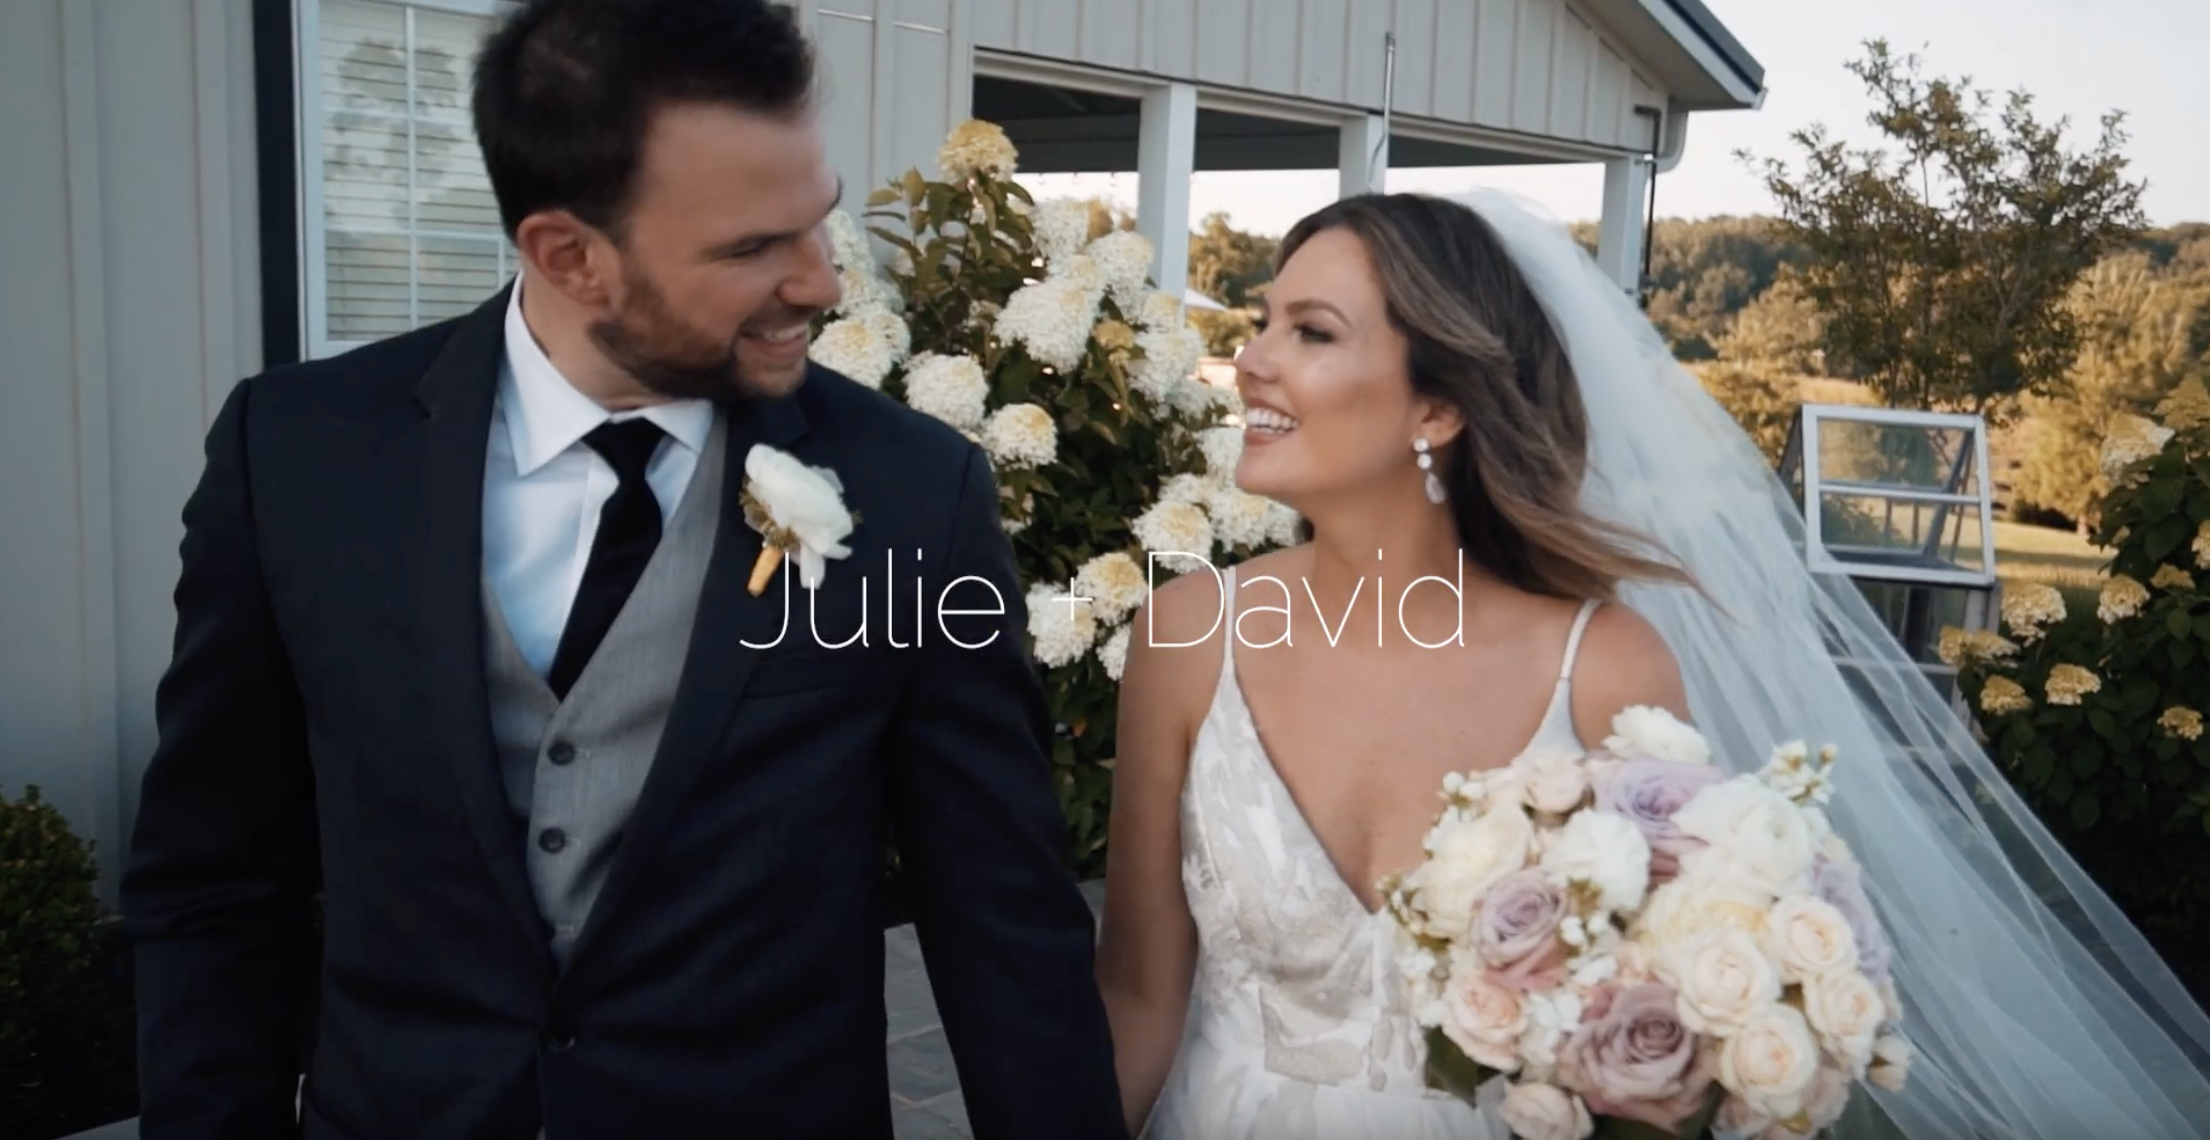 Julie + David | Purcellville, Virginia | Shadow Creek